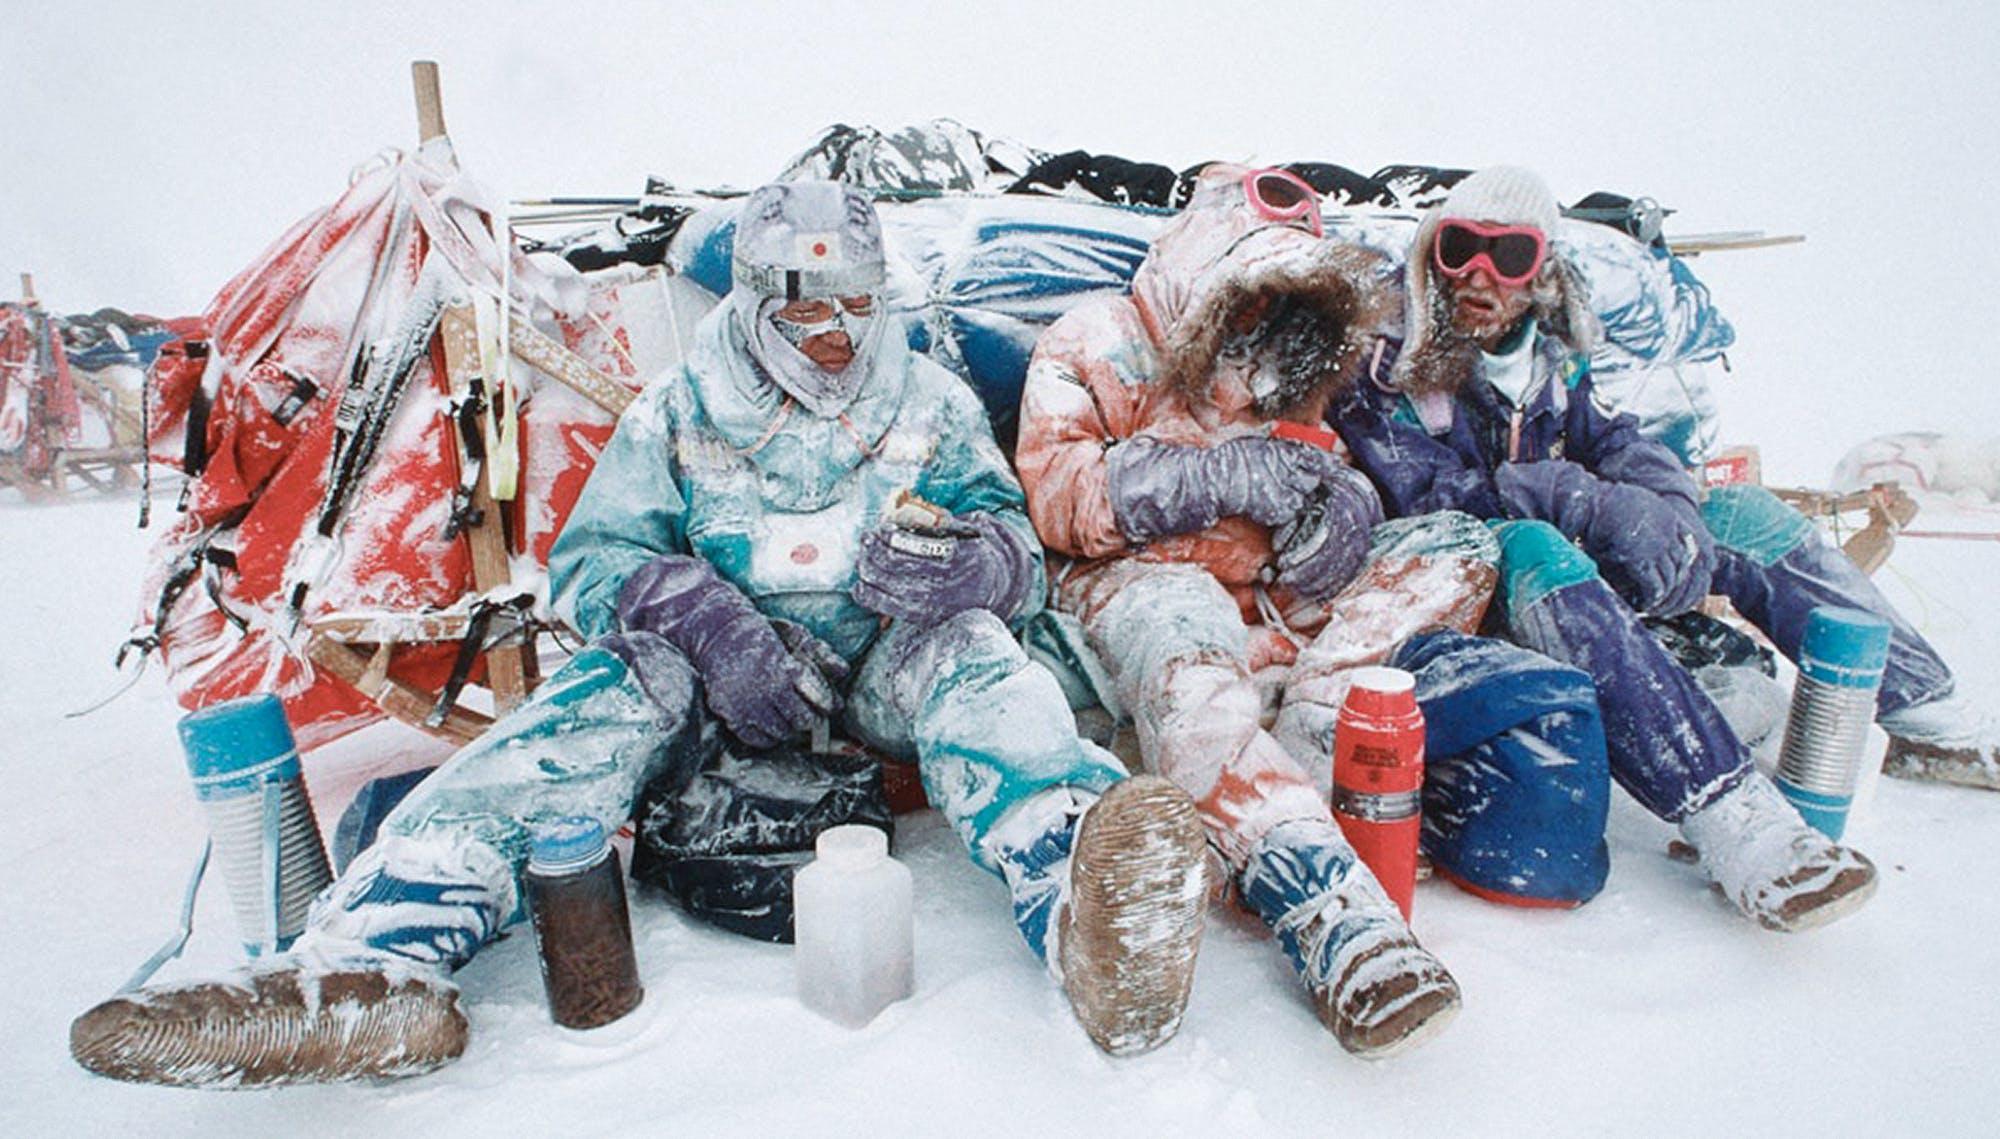 'After Antarctica'